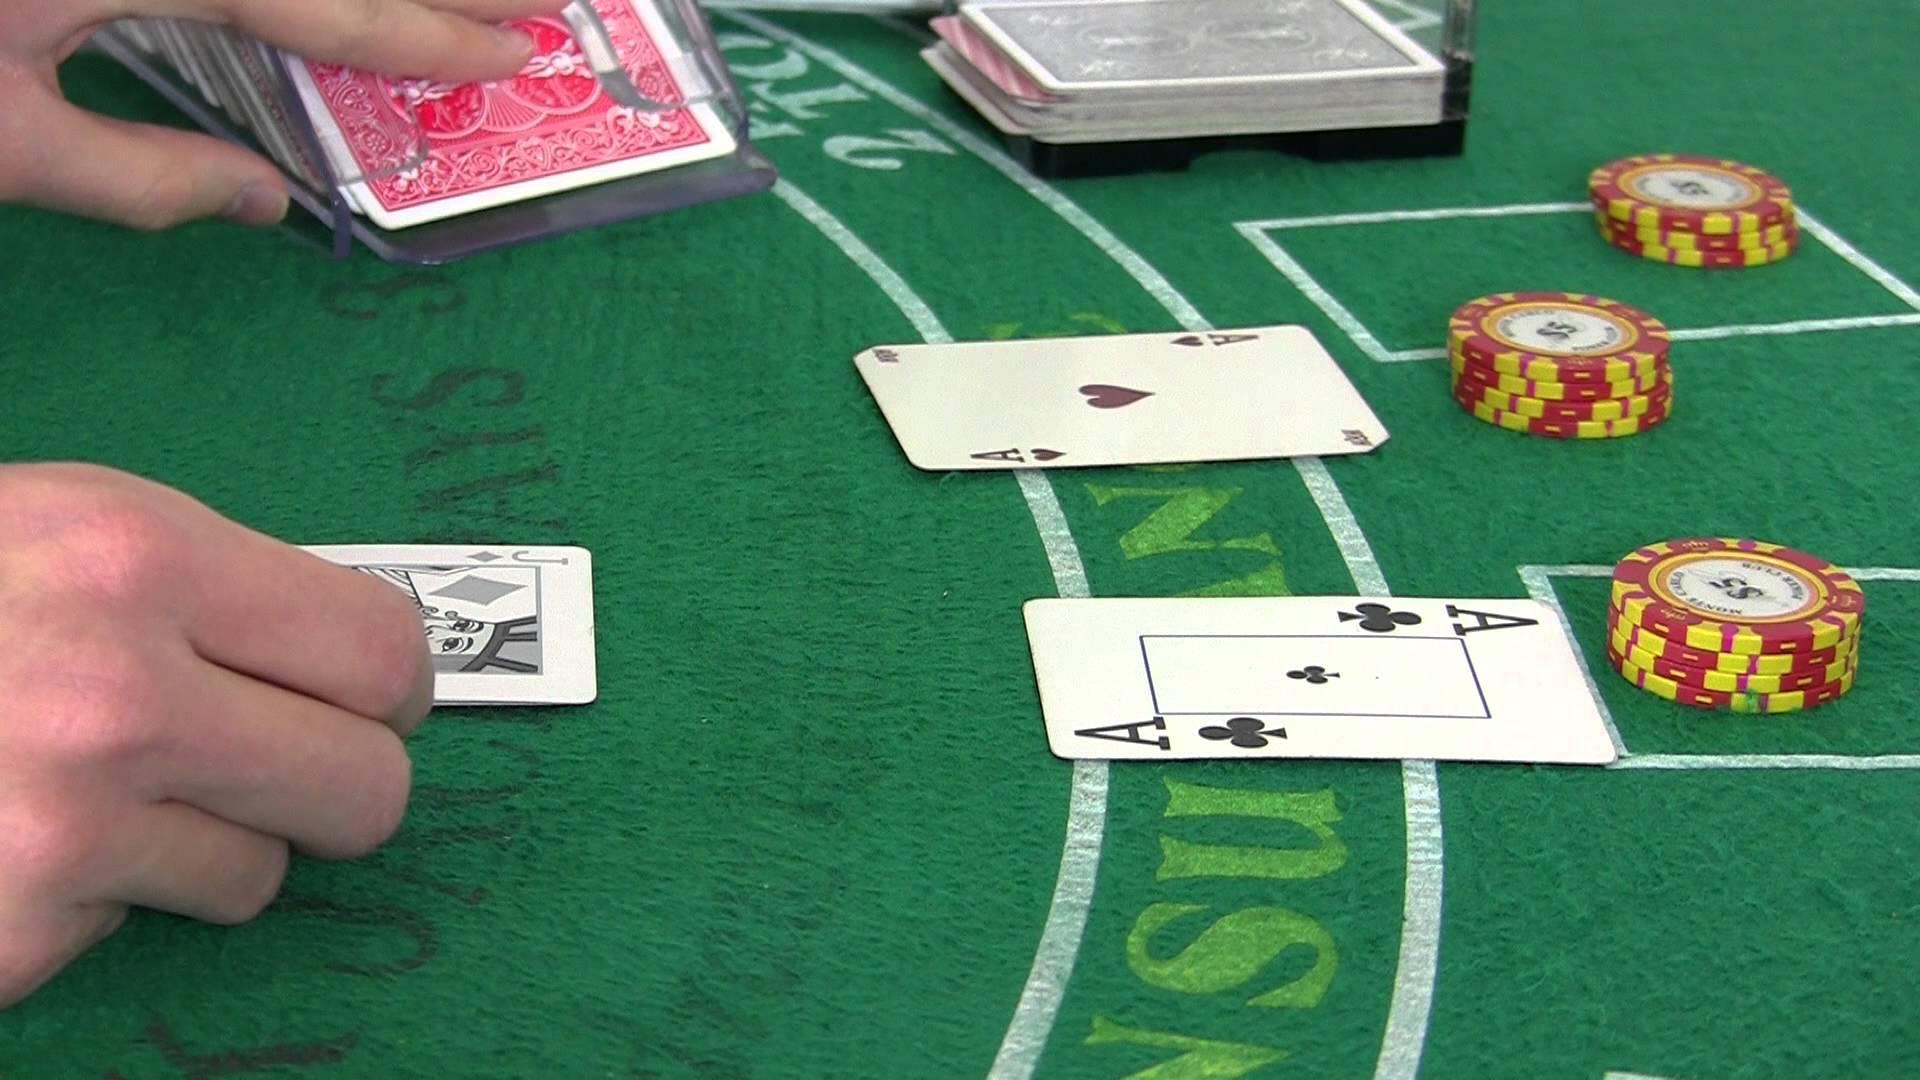 Blackjack, jouer et gagner en ligne